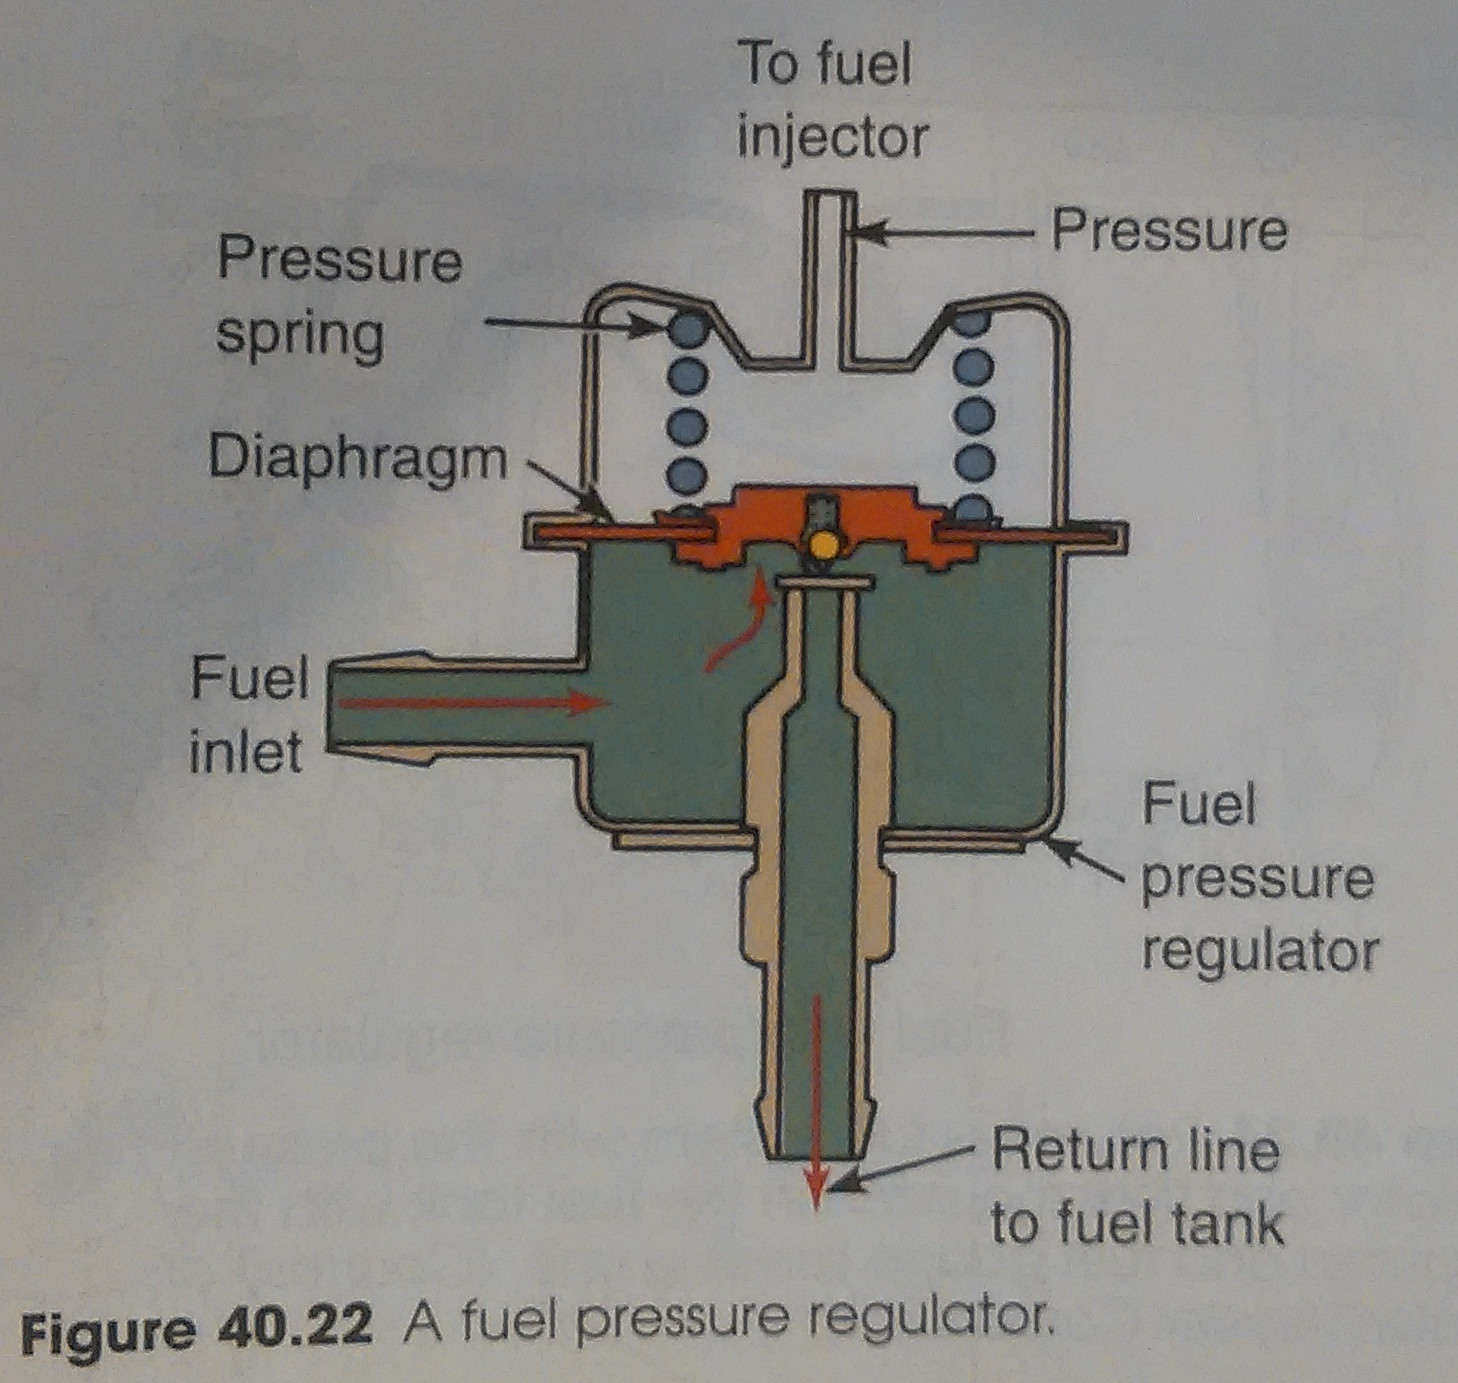 hight resolution of mazda 626 do fuel pressure regulators allow some fuel to flow even mazda tribute fuel system diagram mazda fuel pressure diagram